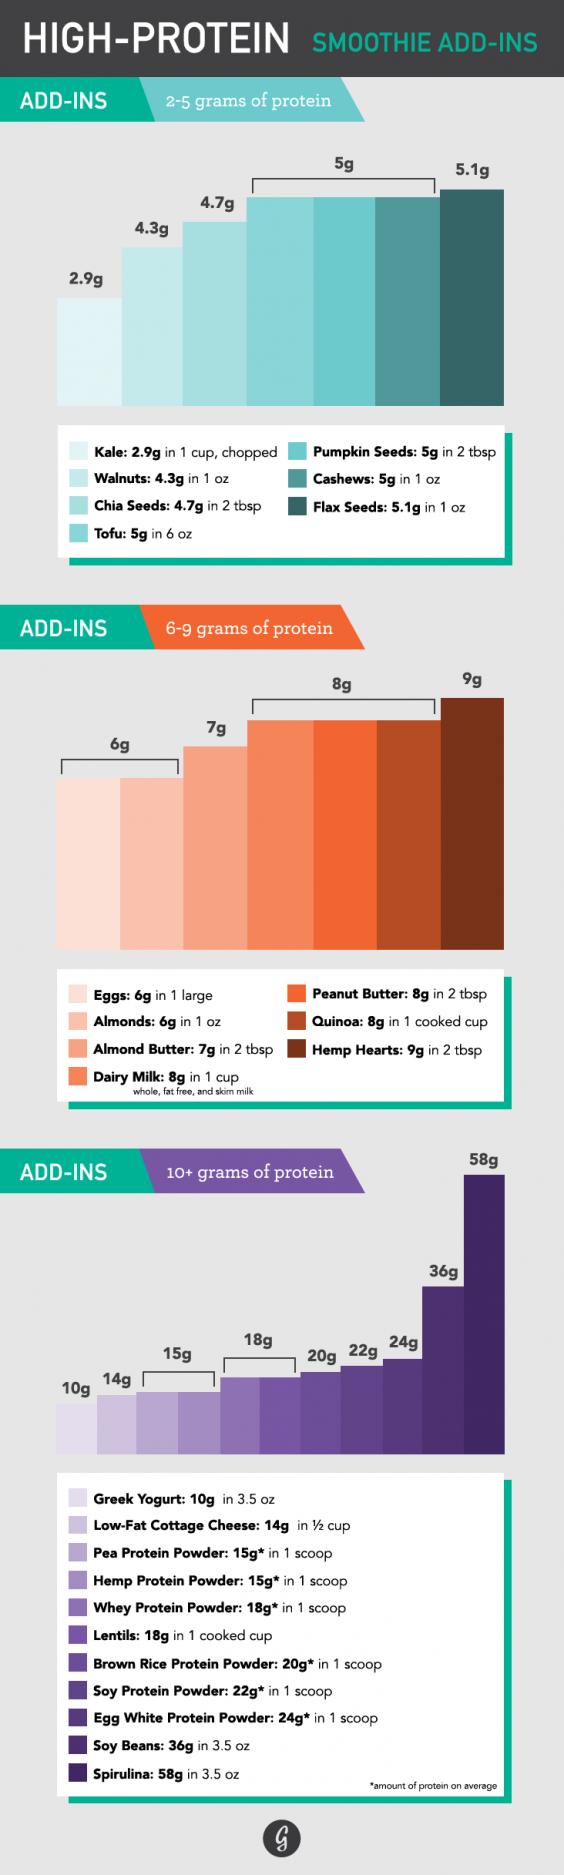 Protein Add-ins